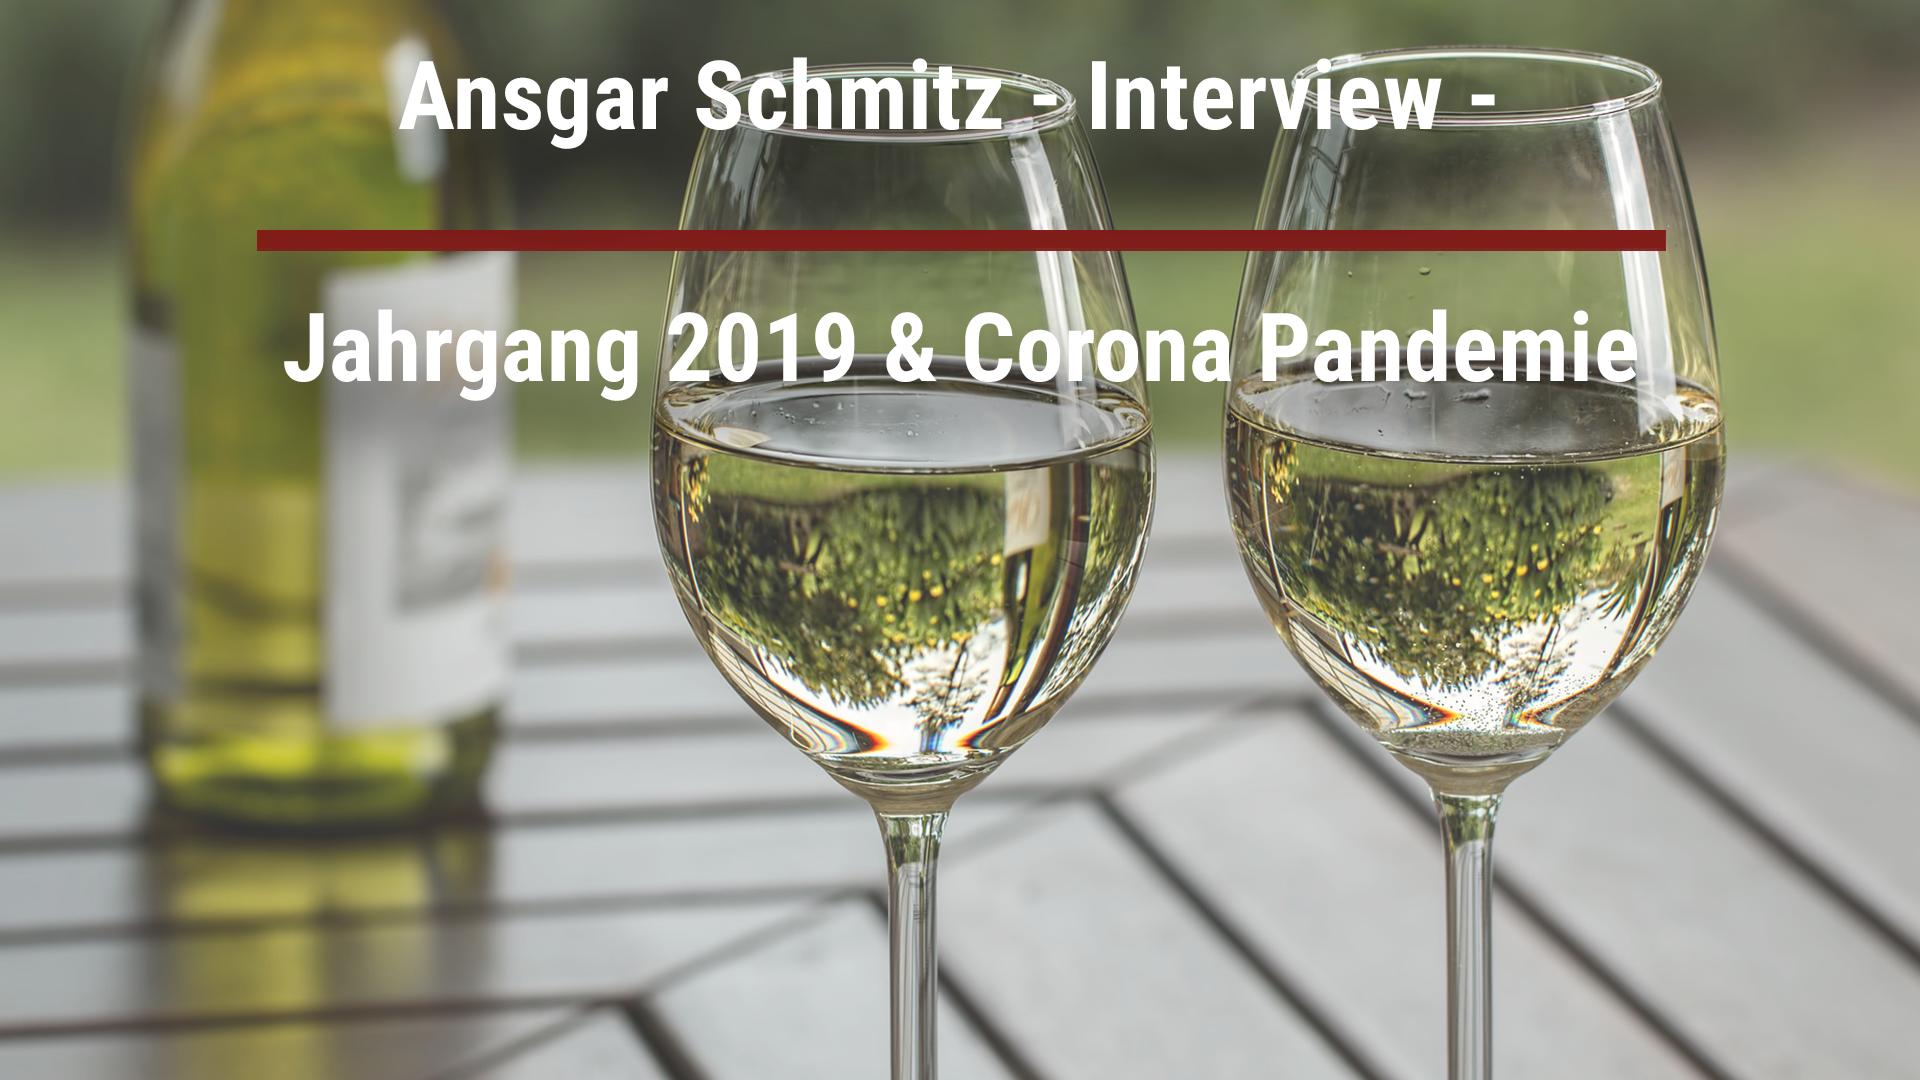 Ansgar Schmitz – Interview – Volume 2019 & Corona Pandemic